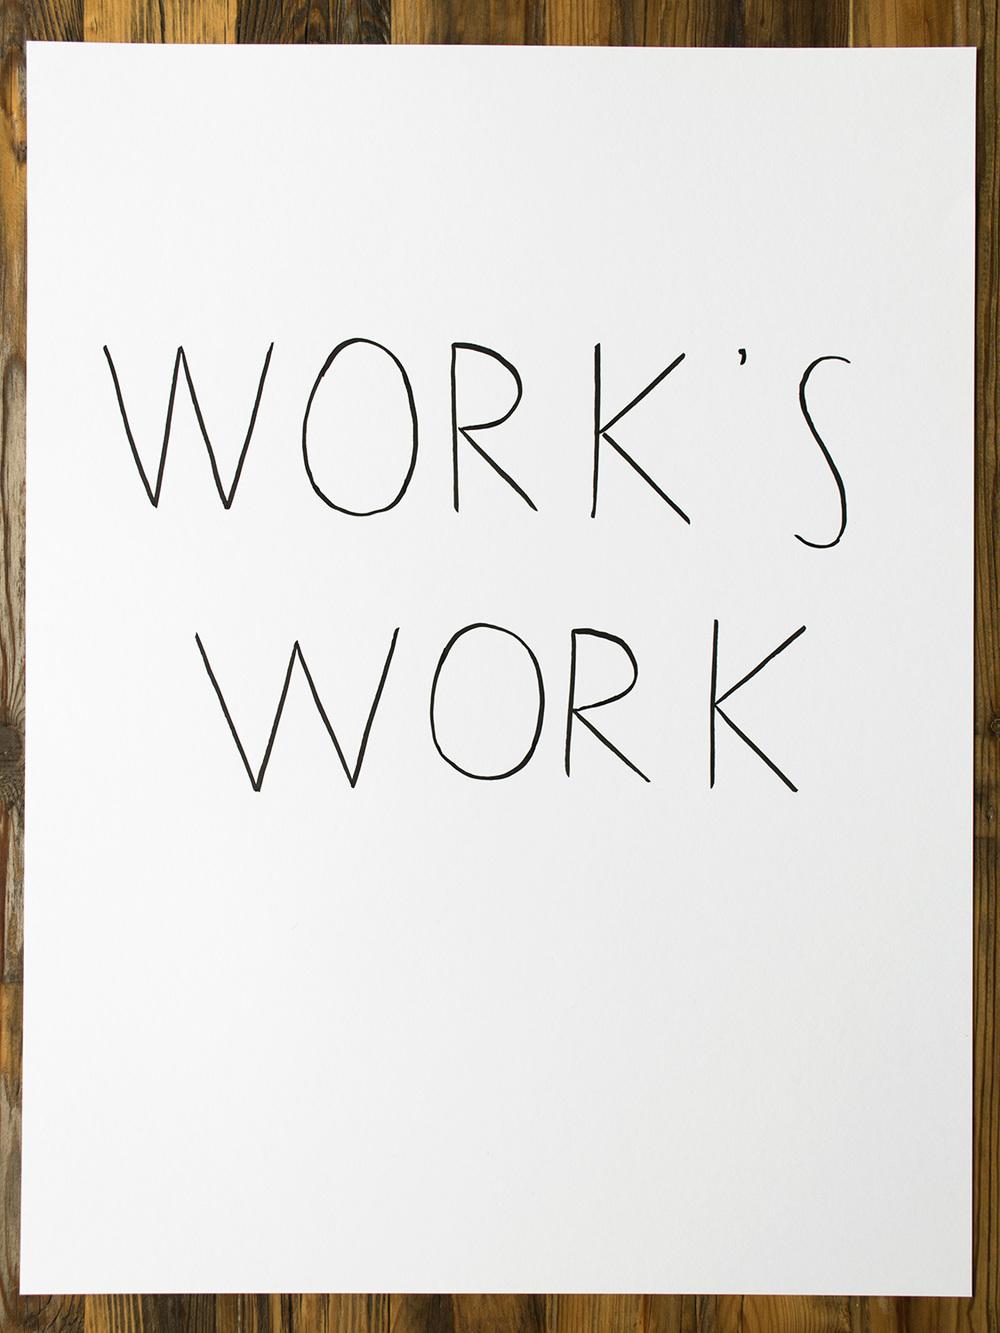 works_work-1500x1125.jpg